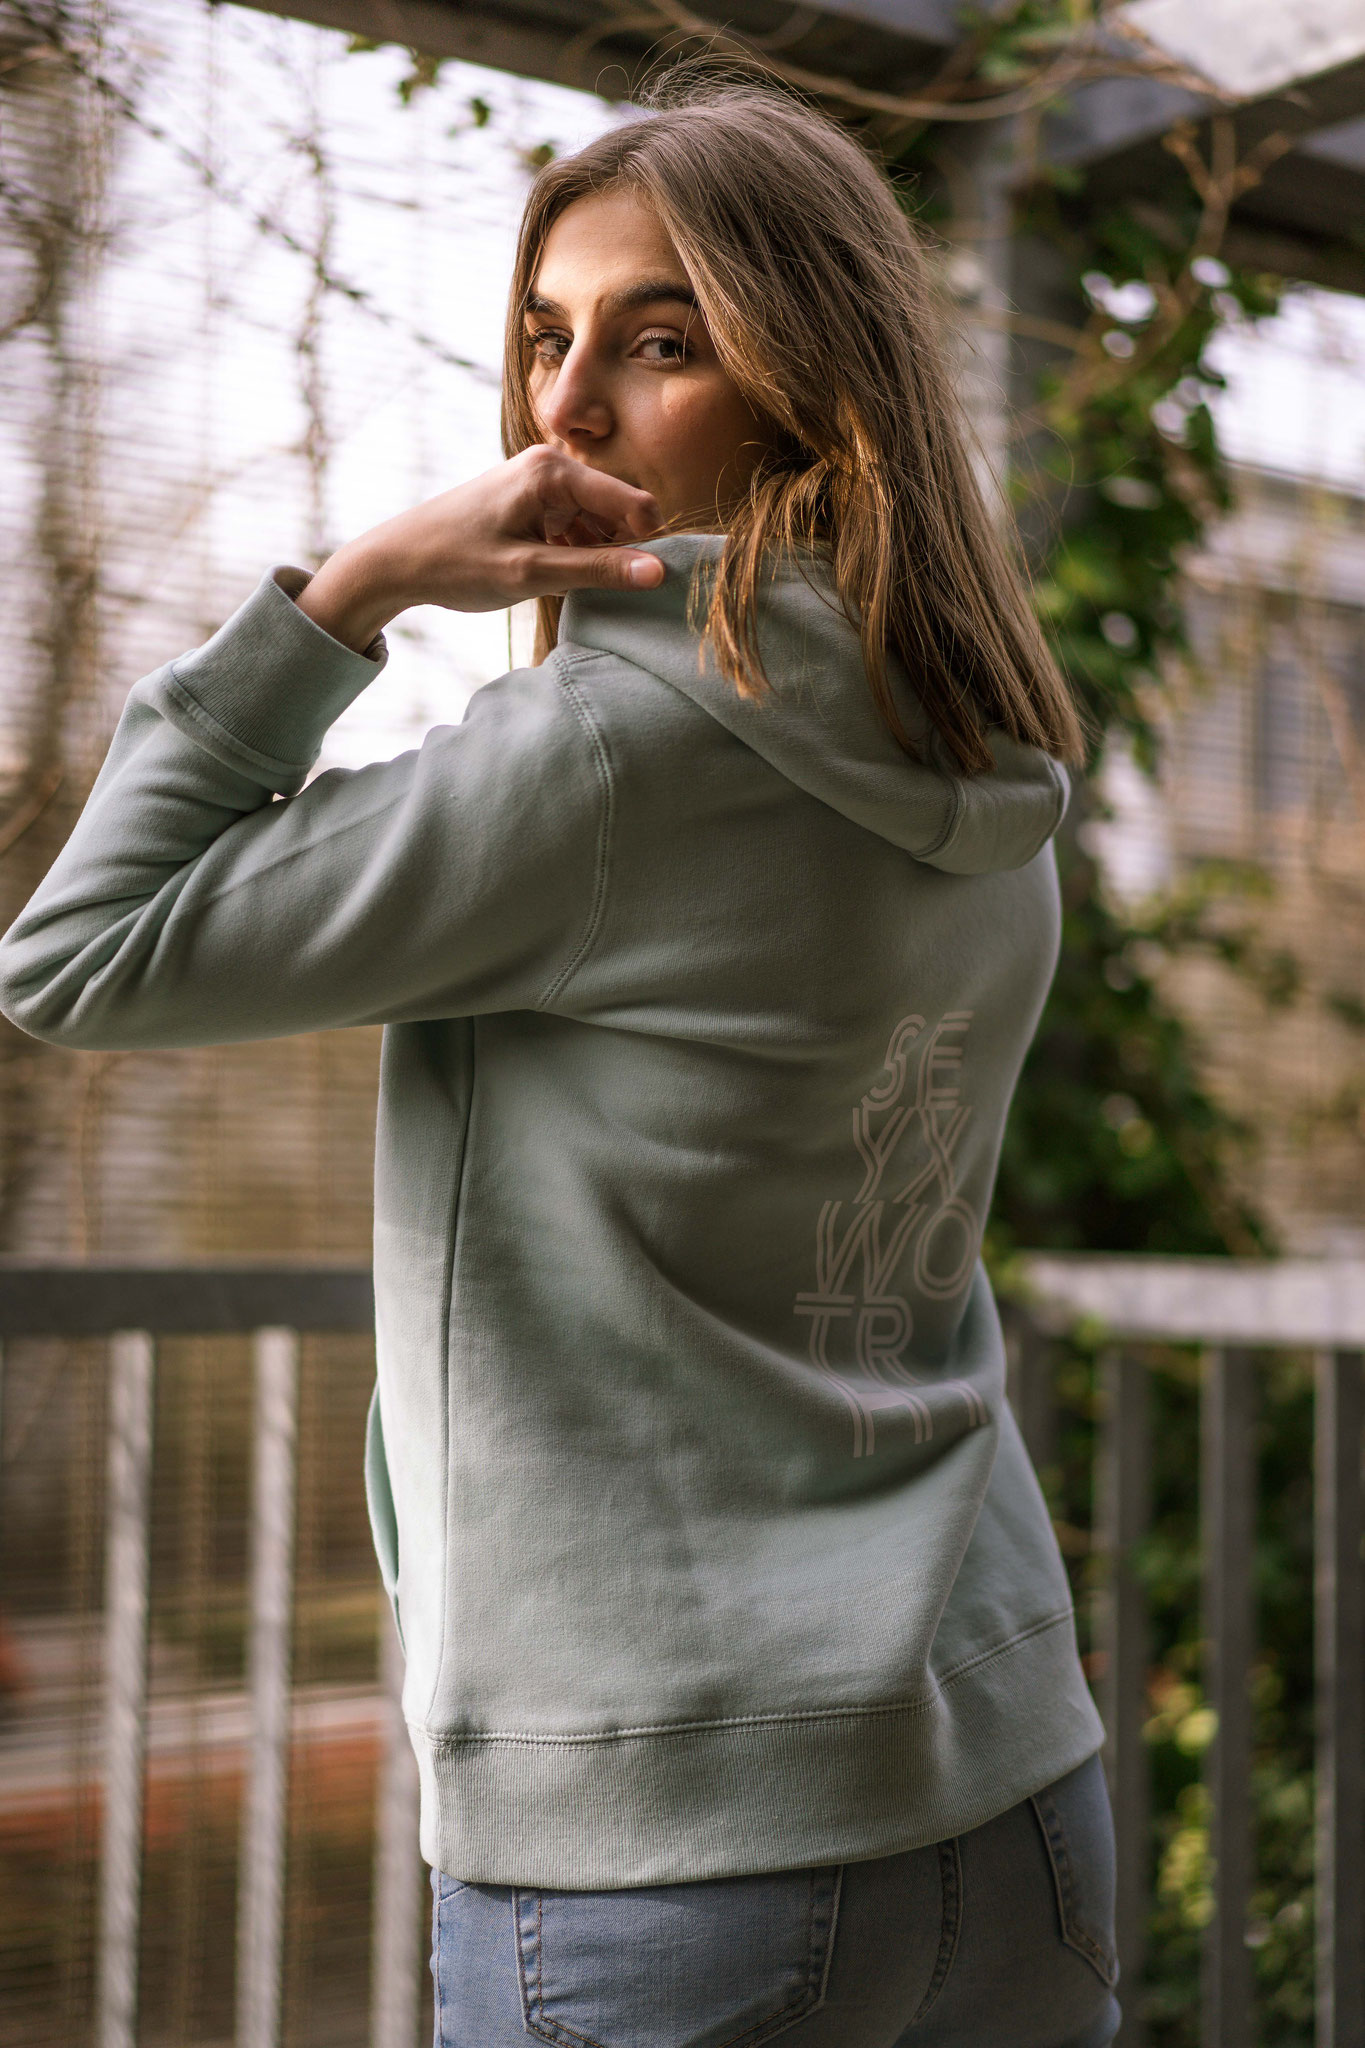 Pastelgroene sweater met witte print Sexy & Worthy - Iwrite4U merch